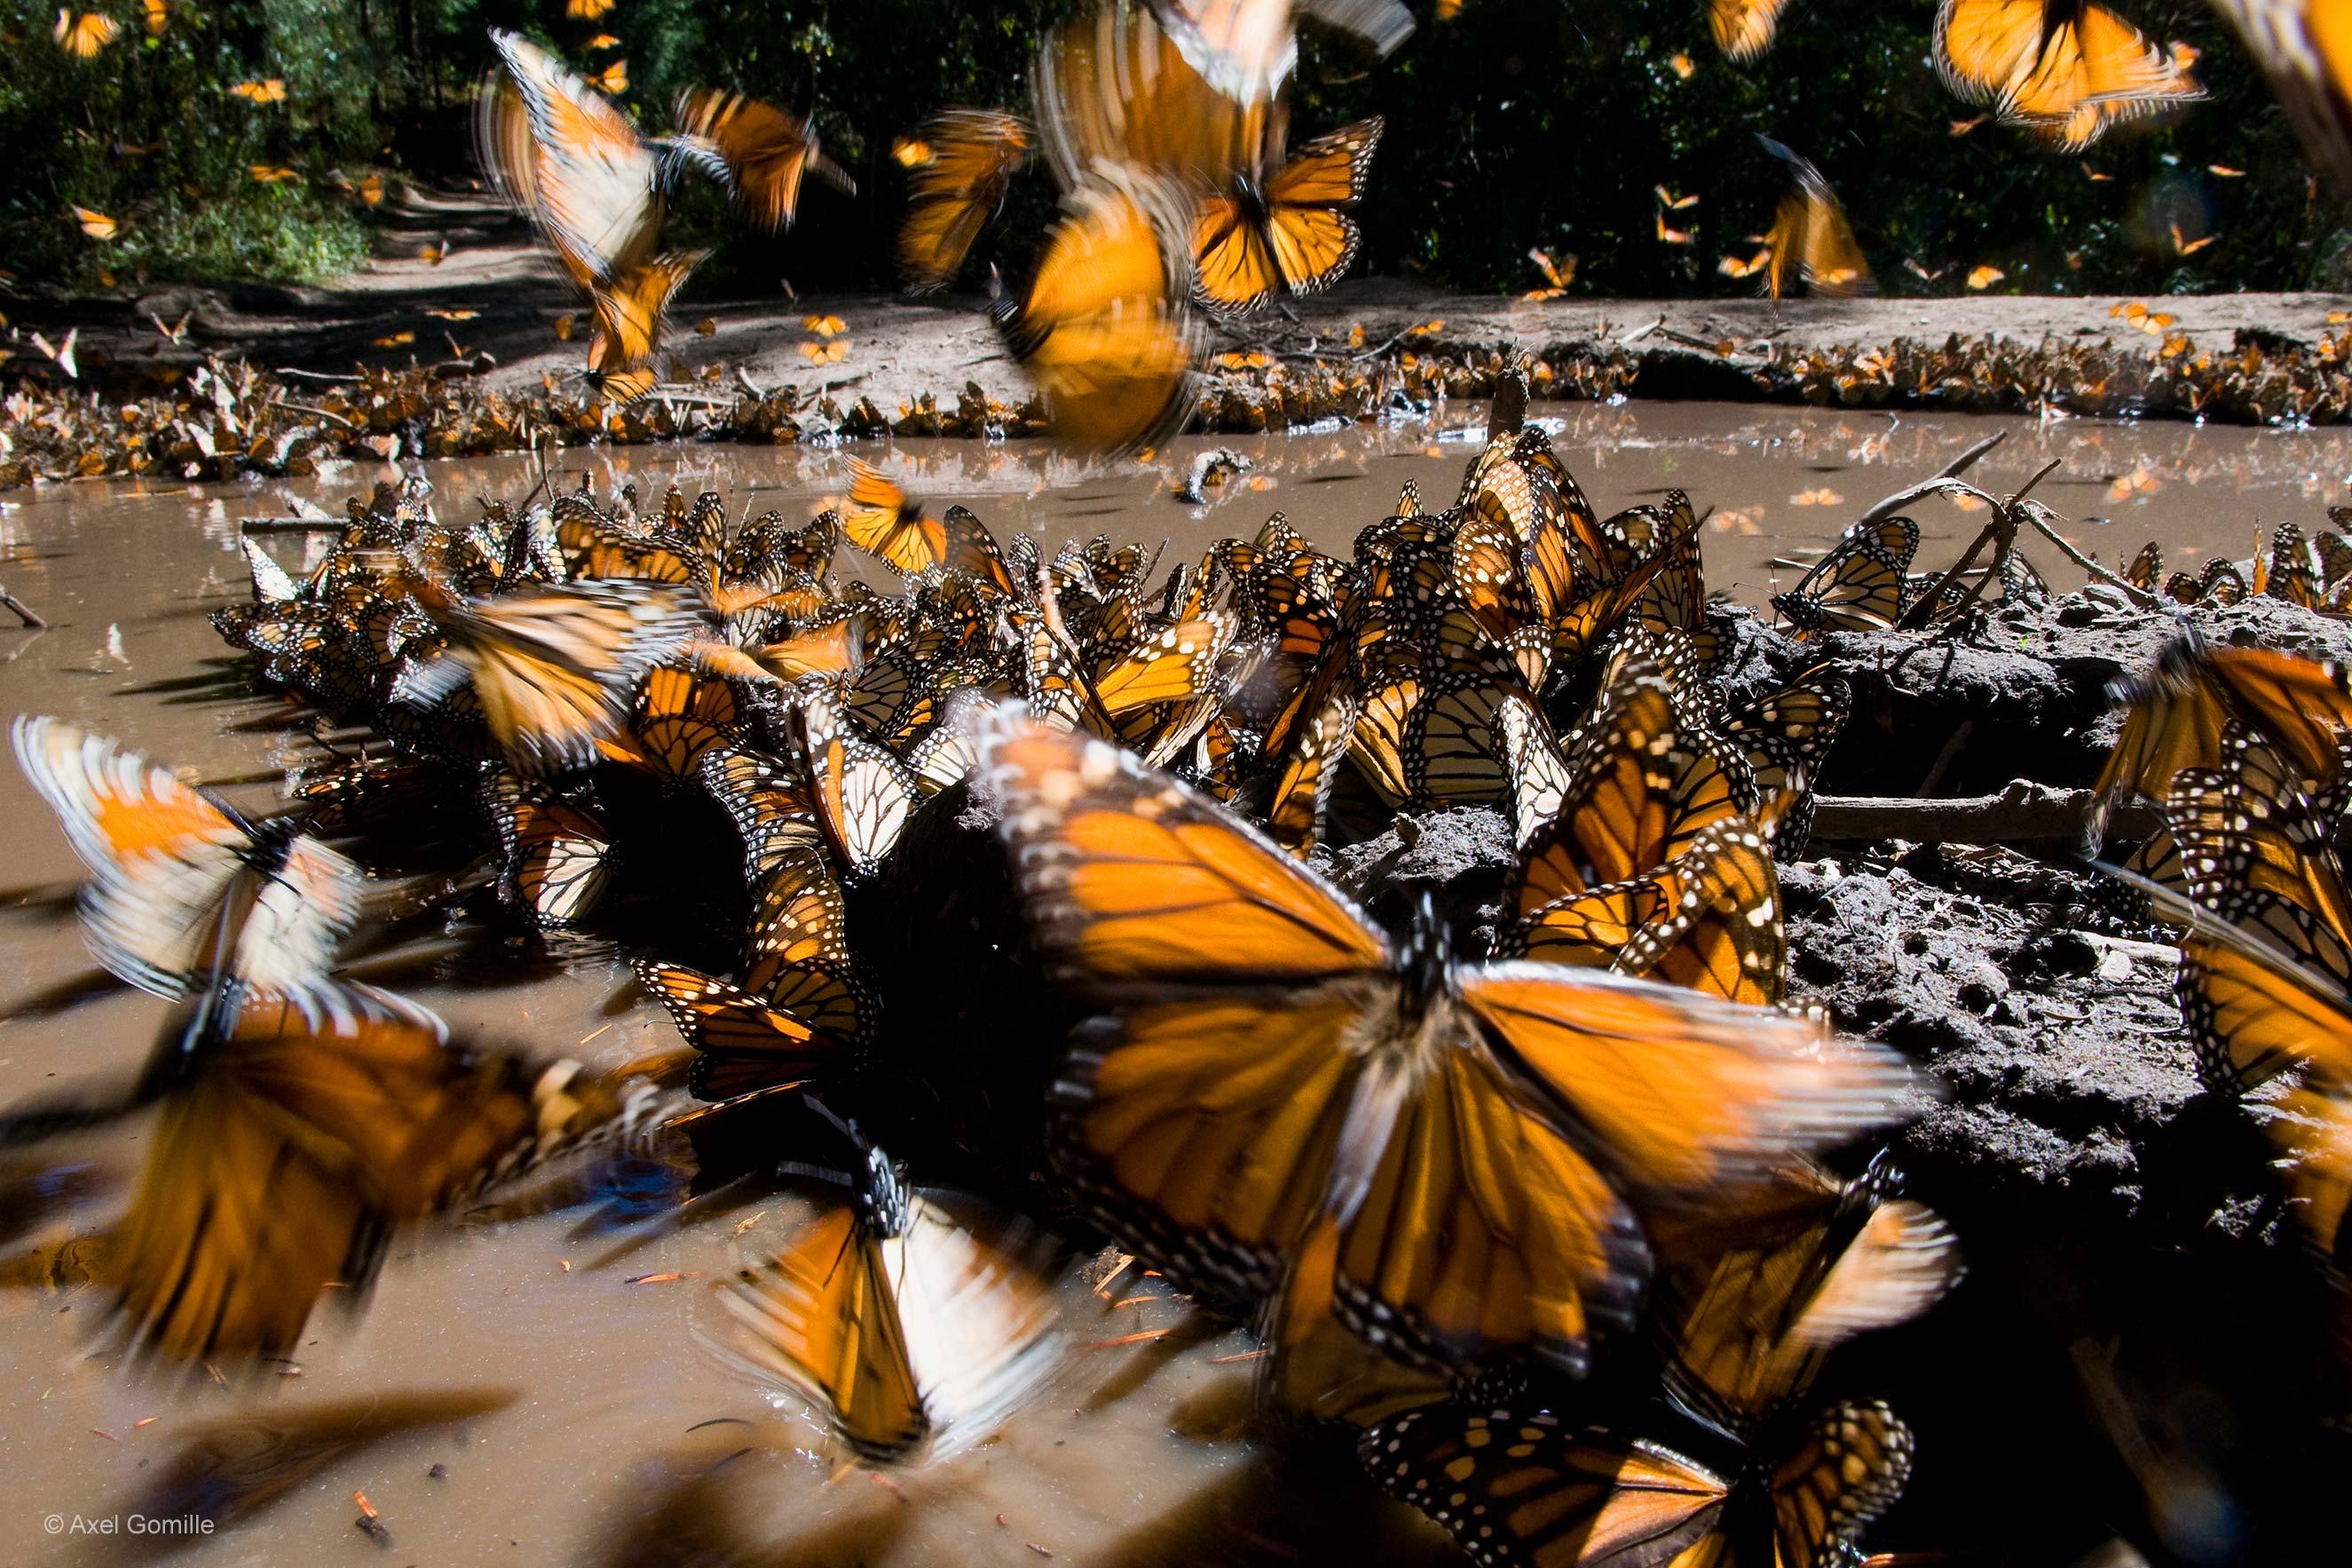 foto-4-monarchs-axel-gomille